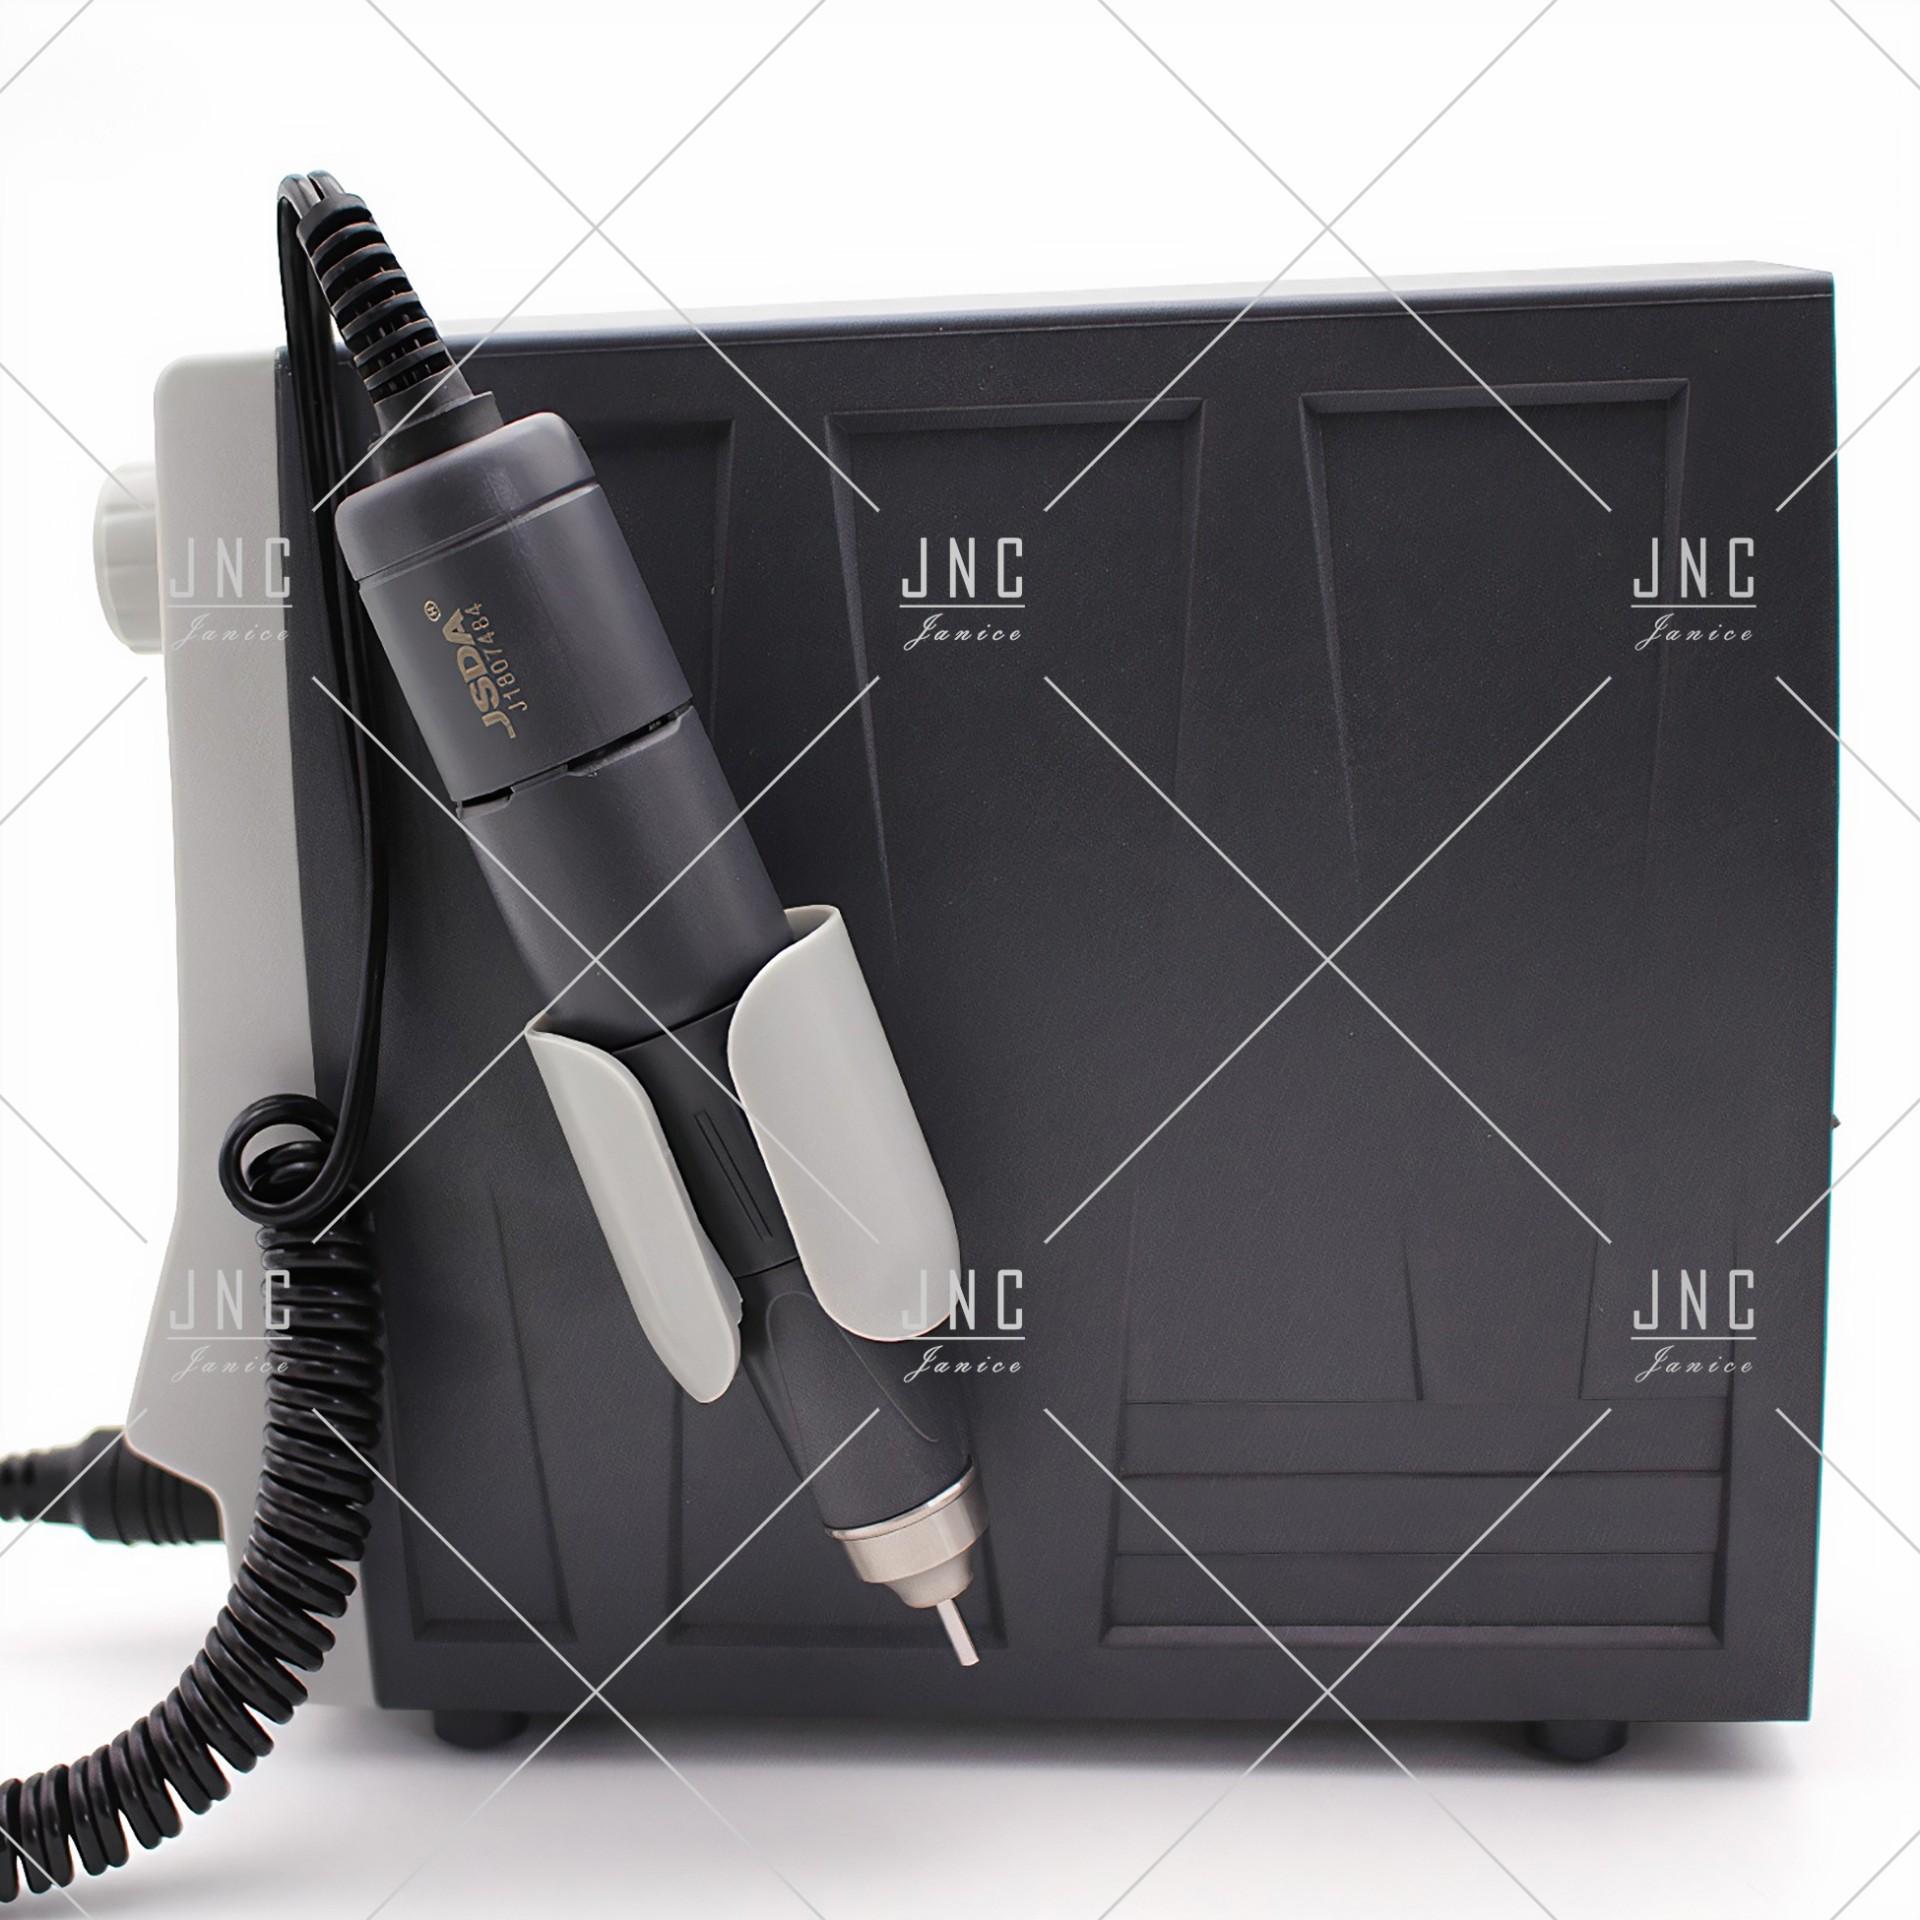 Micromotor Set Manicure 35000 RPM | Ref.JD5500